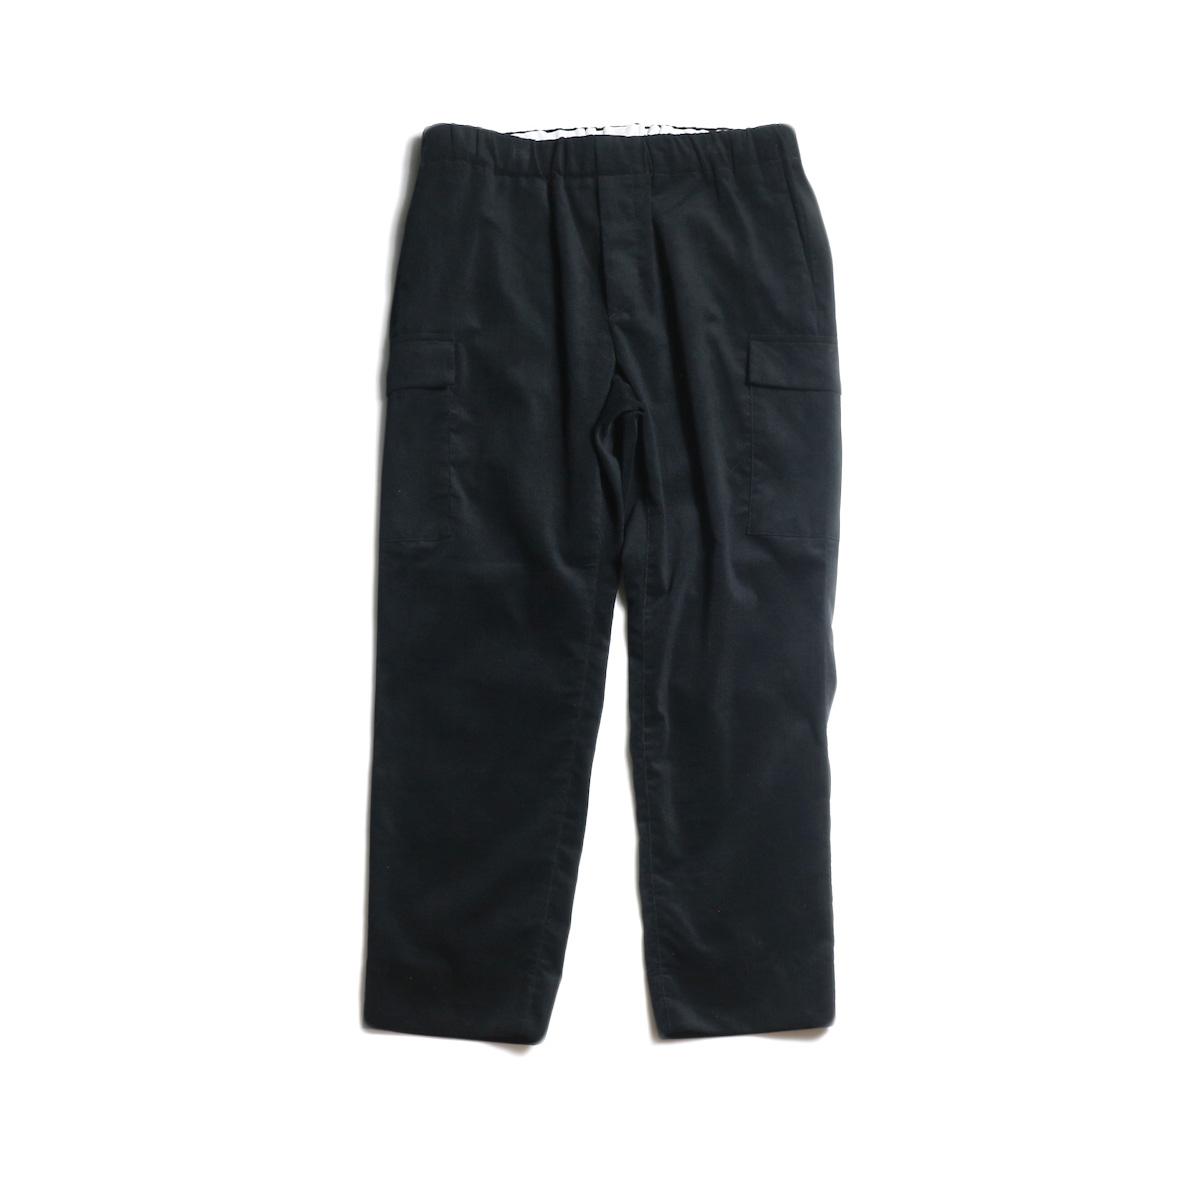 FUTURE PRIMITIVE / FP EASY CARGO PANTS CORDUROY (Black)